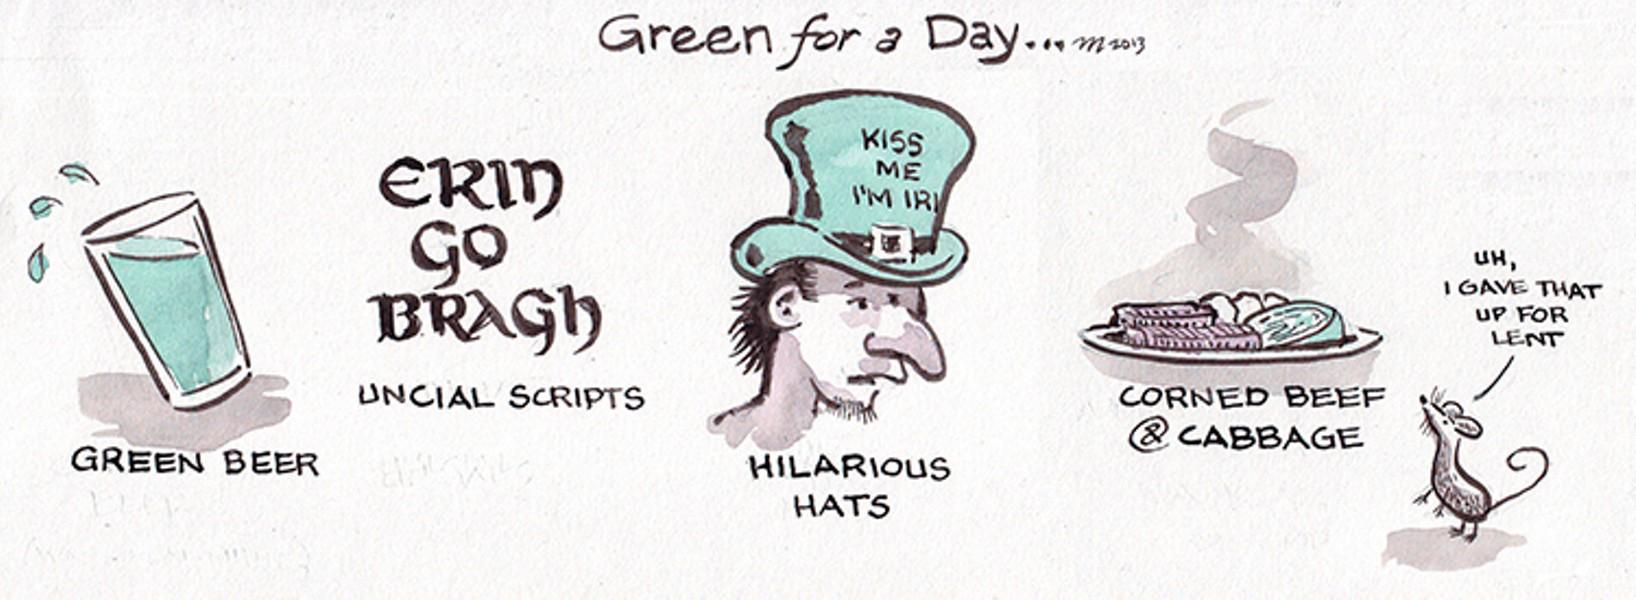 Green For A Day - JOEL MIELKE